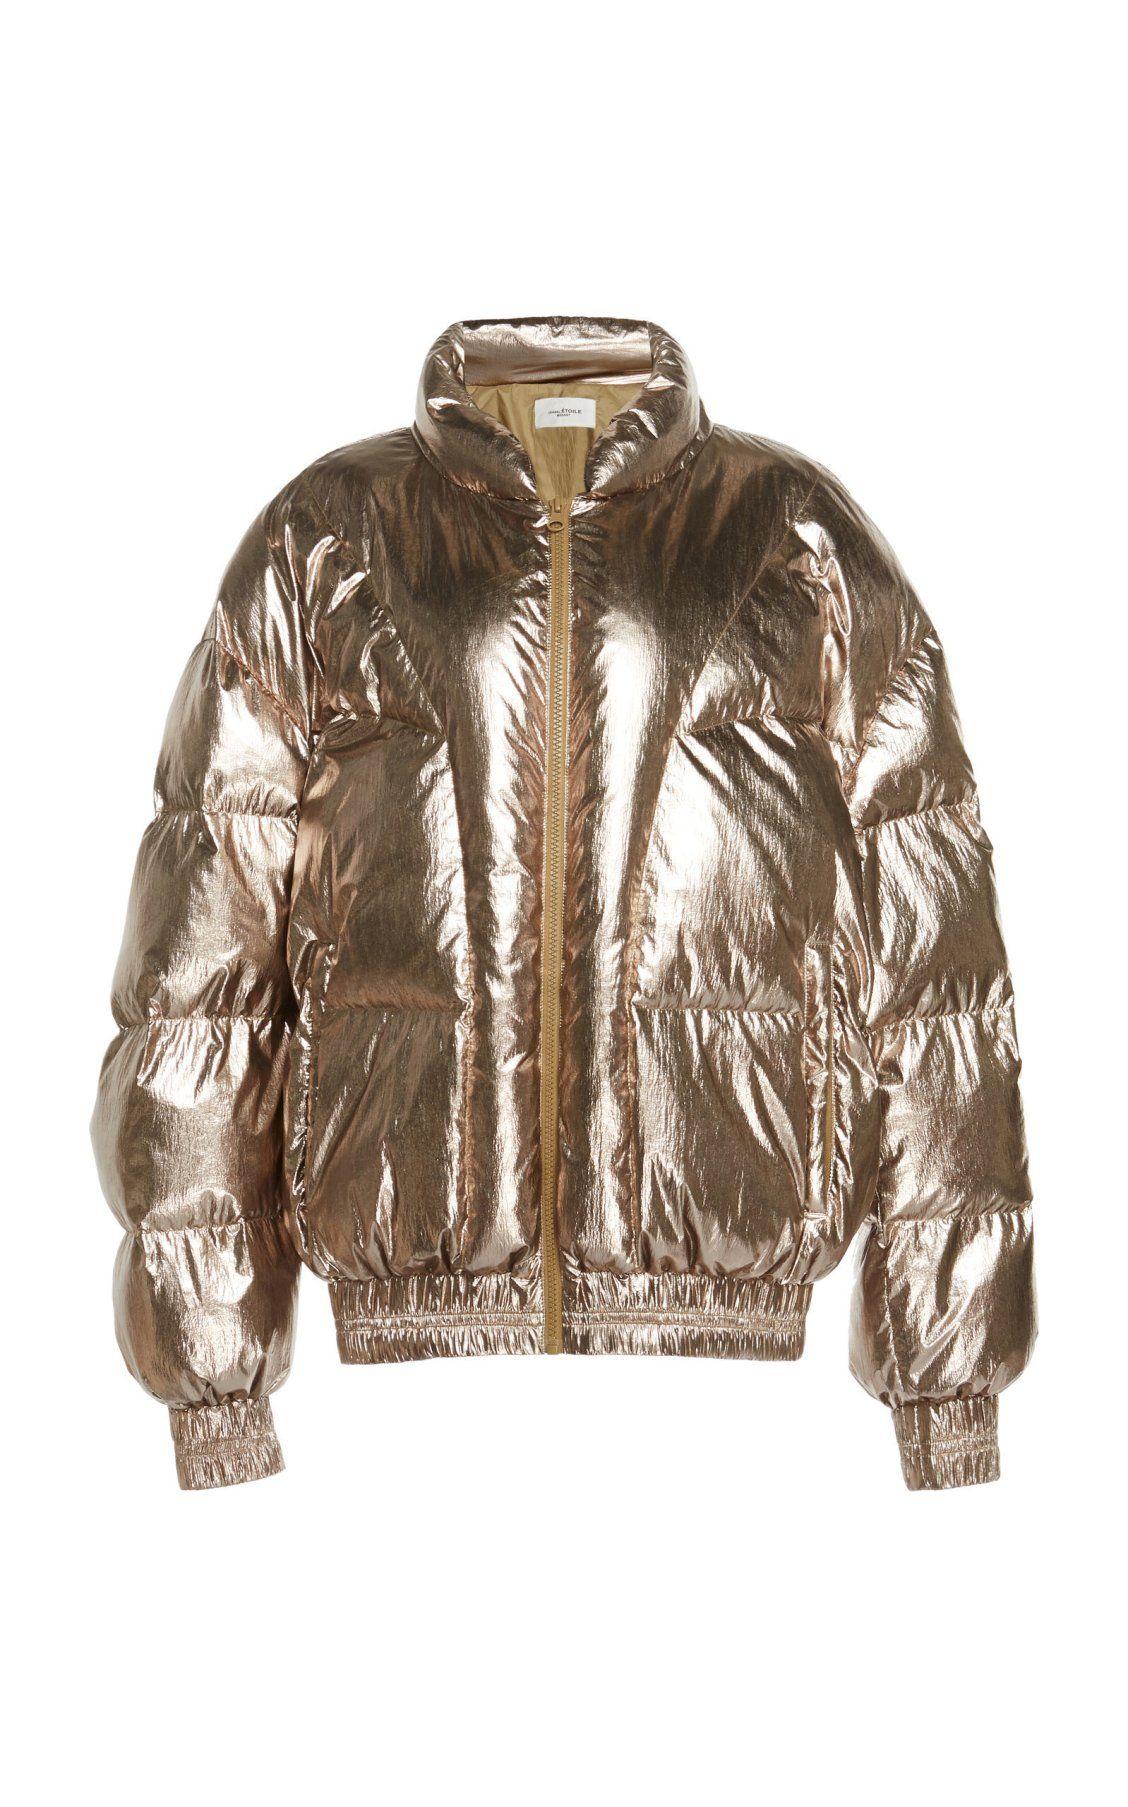 Kristen Puffer Coat By Isabel Marant Etoile Pf19 Moda Operandi Fashion Isabel Marant Isabel Marant Etoile [ 1807 x 1128 Pixel ]